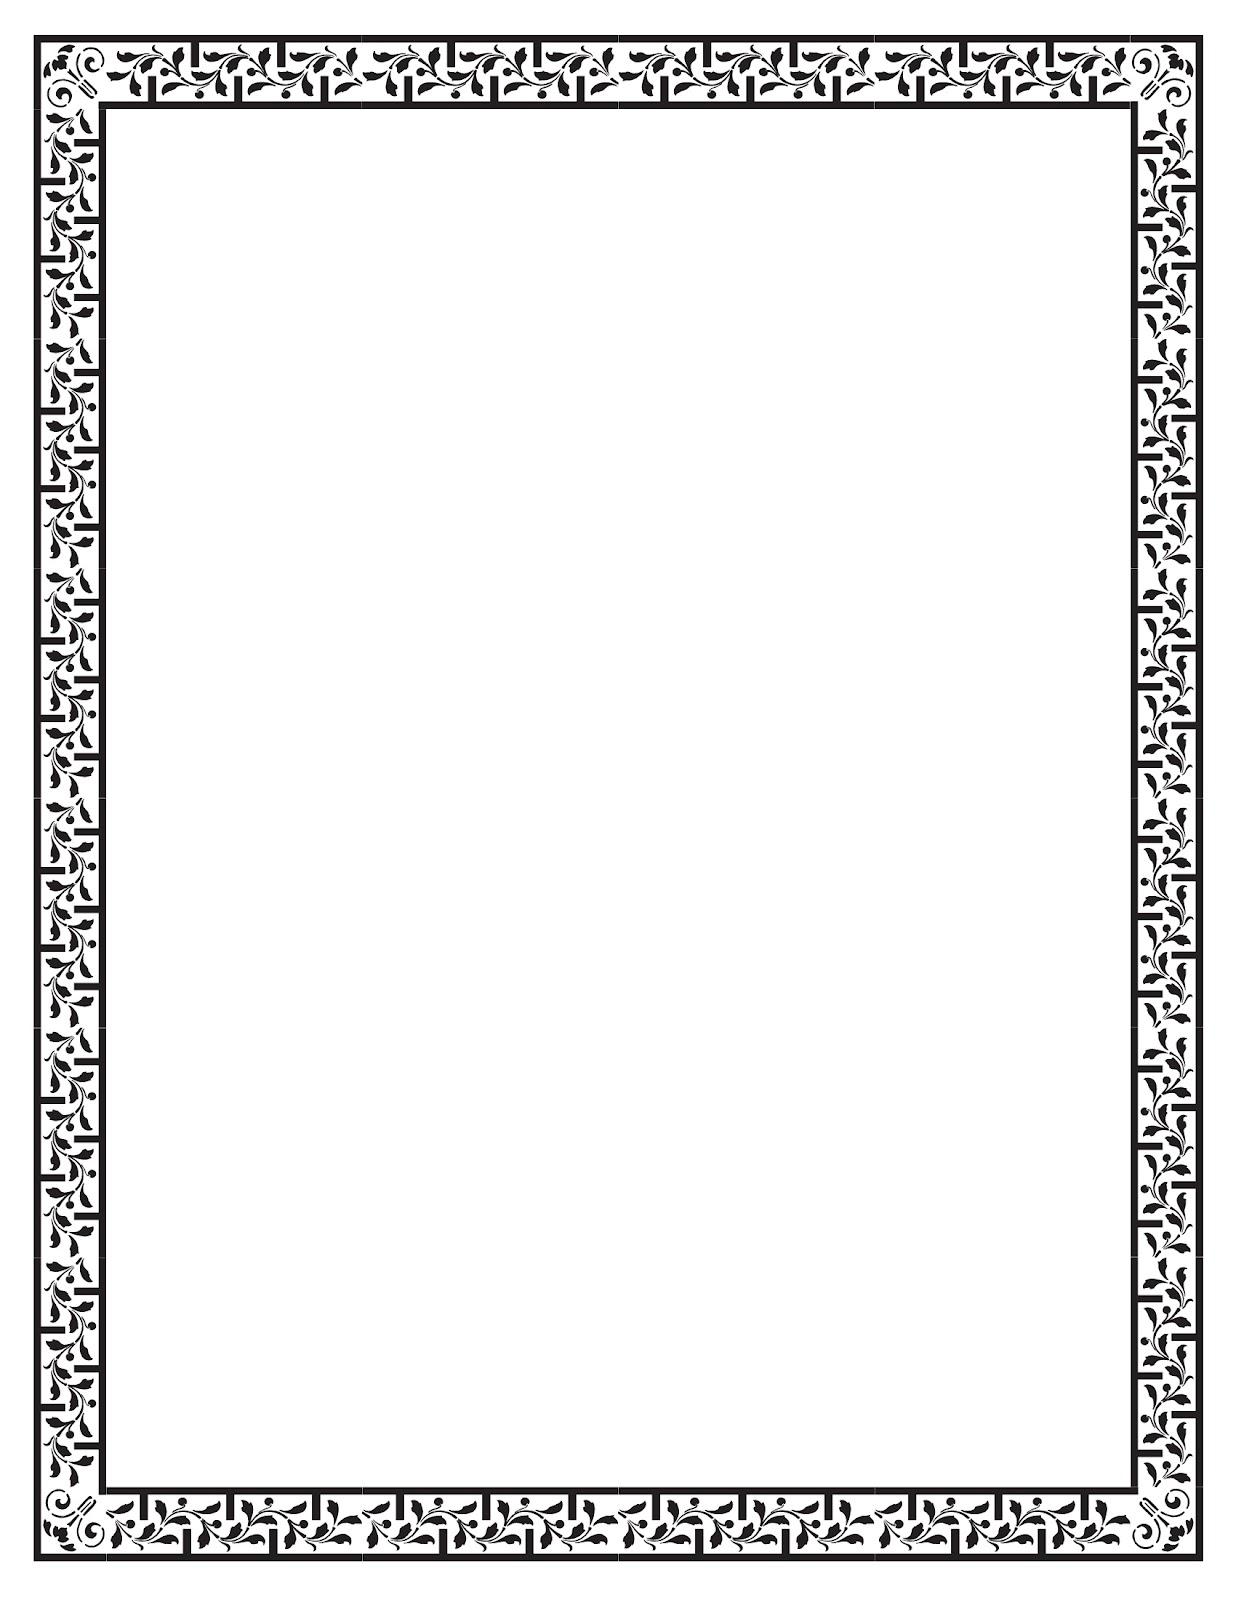 Clipart frames free caicdvrlistscom 2.